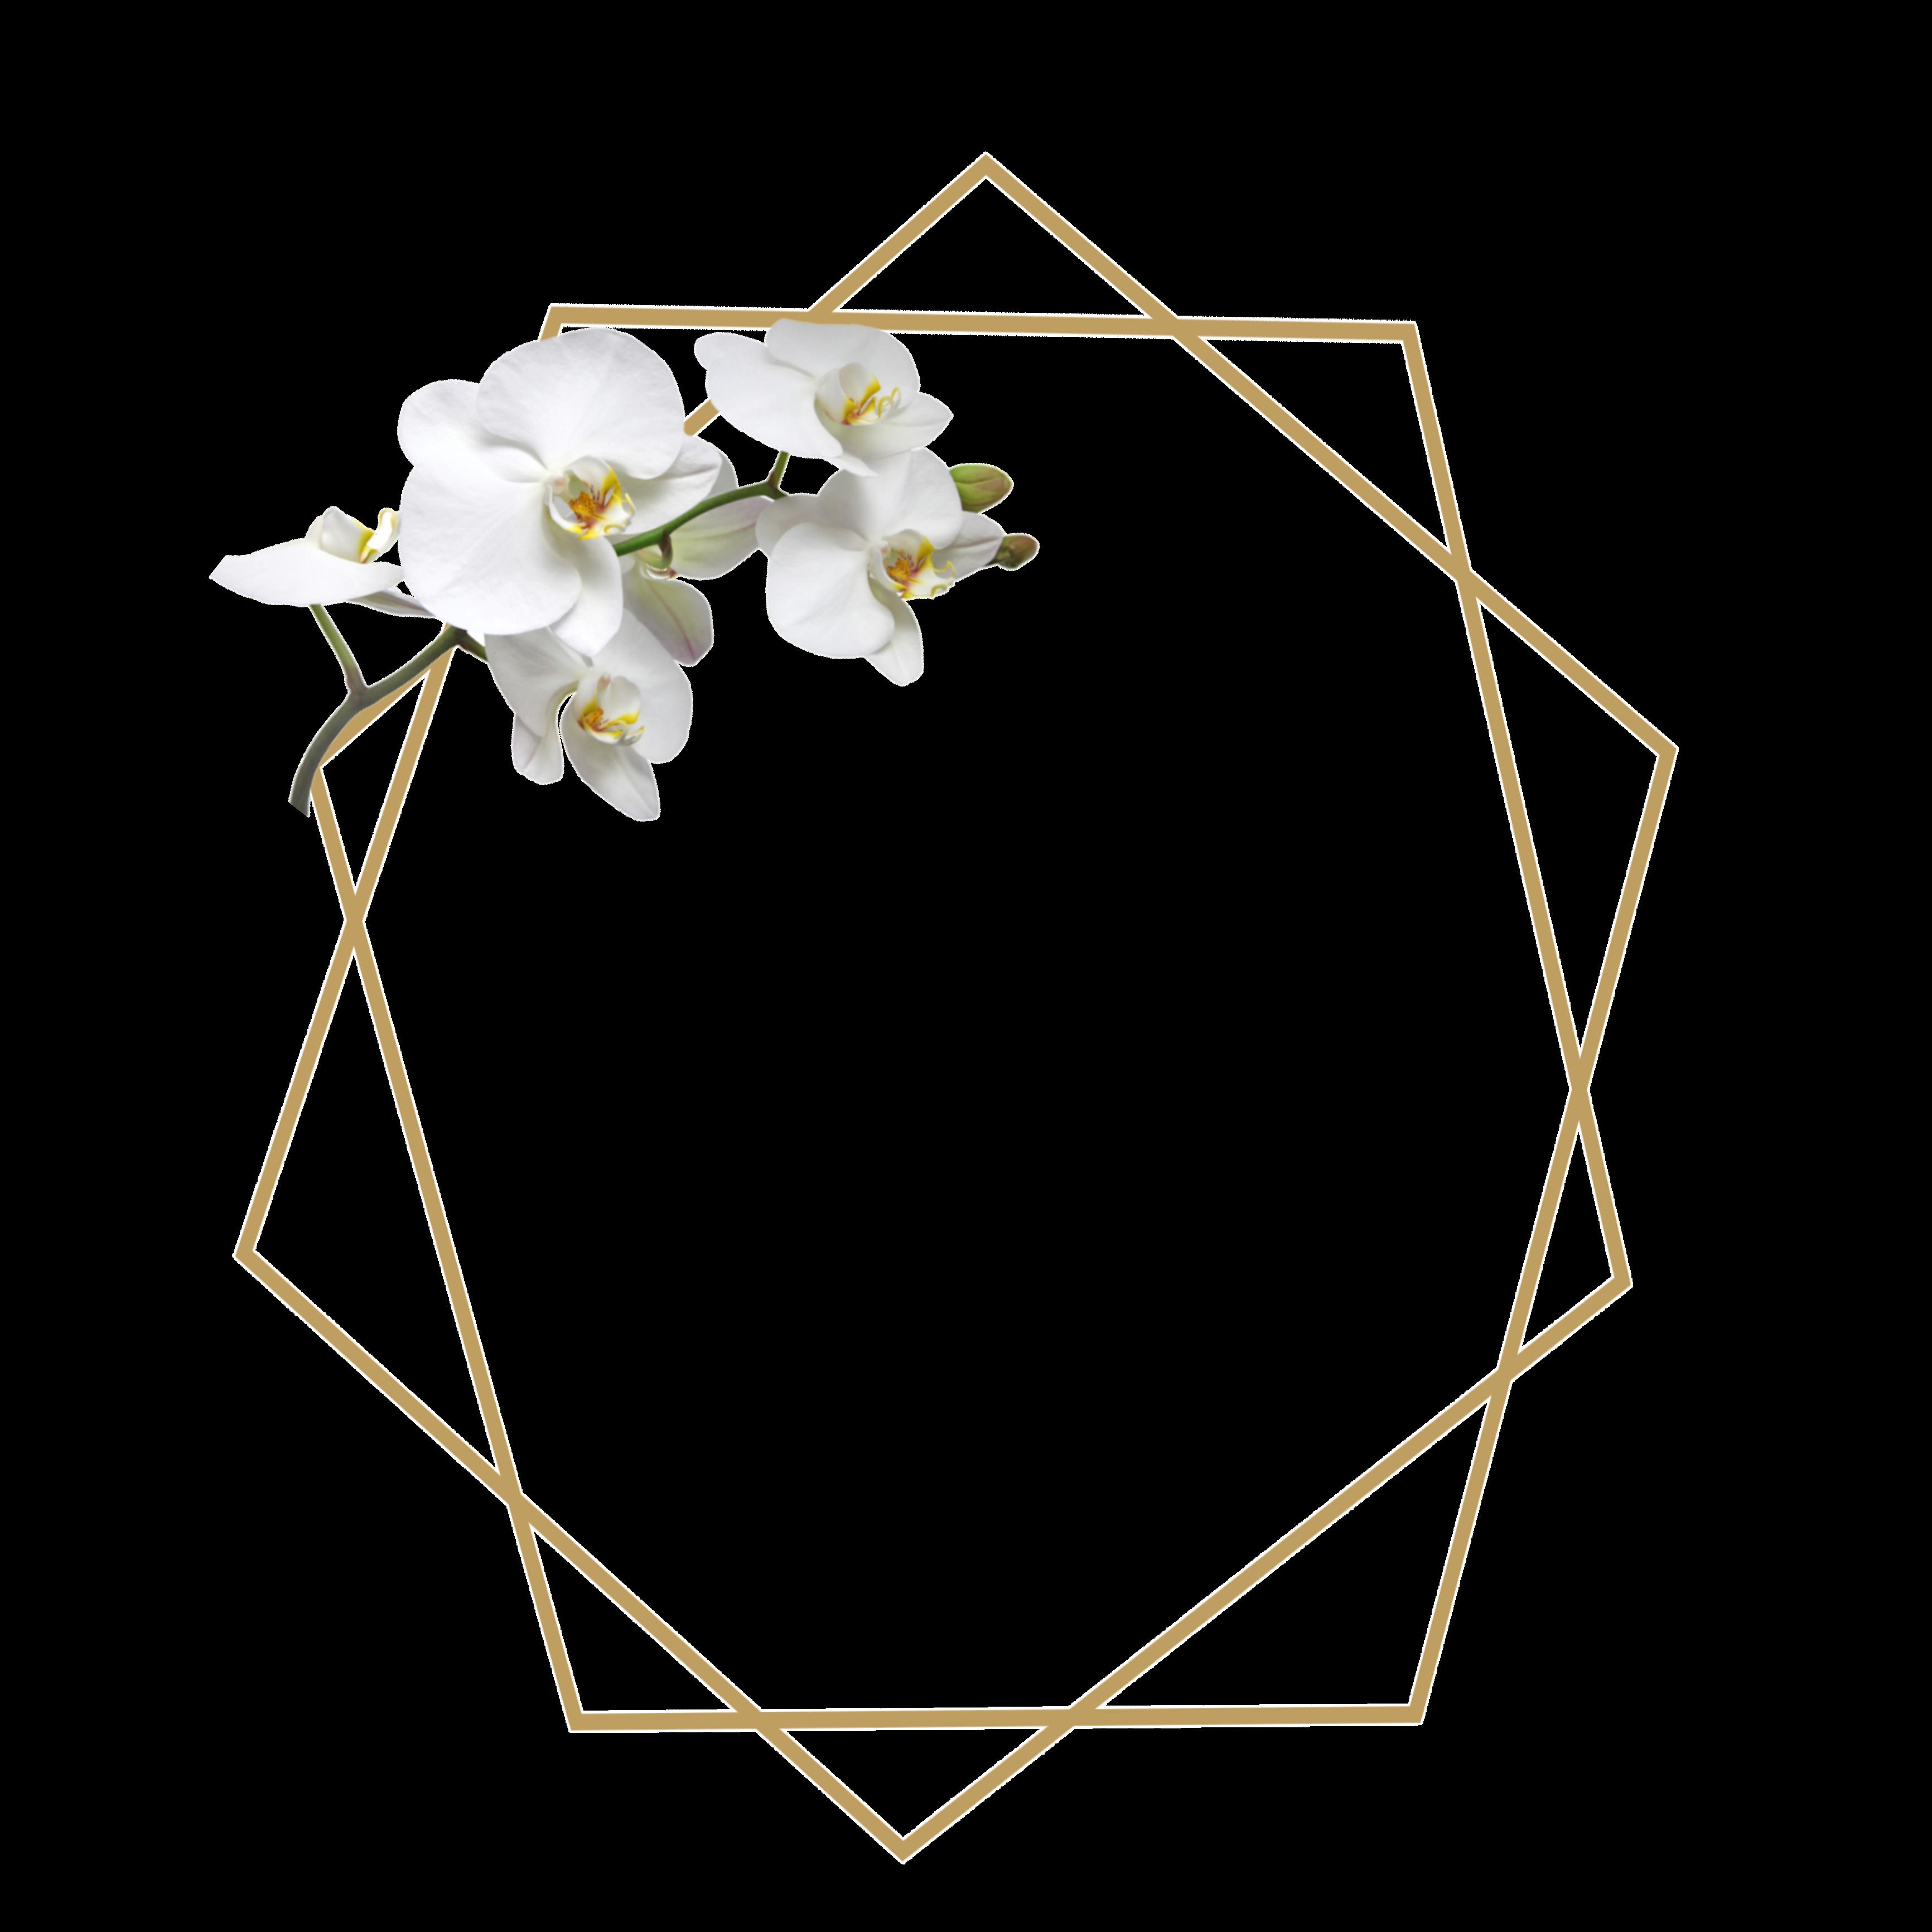 Freetoedit ورد اوركيد ثيم ذهبي اطار Remixed From Mashaelpicsart Roroalrrr Flower Graphic Design Floral Border Design Baby Print Art